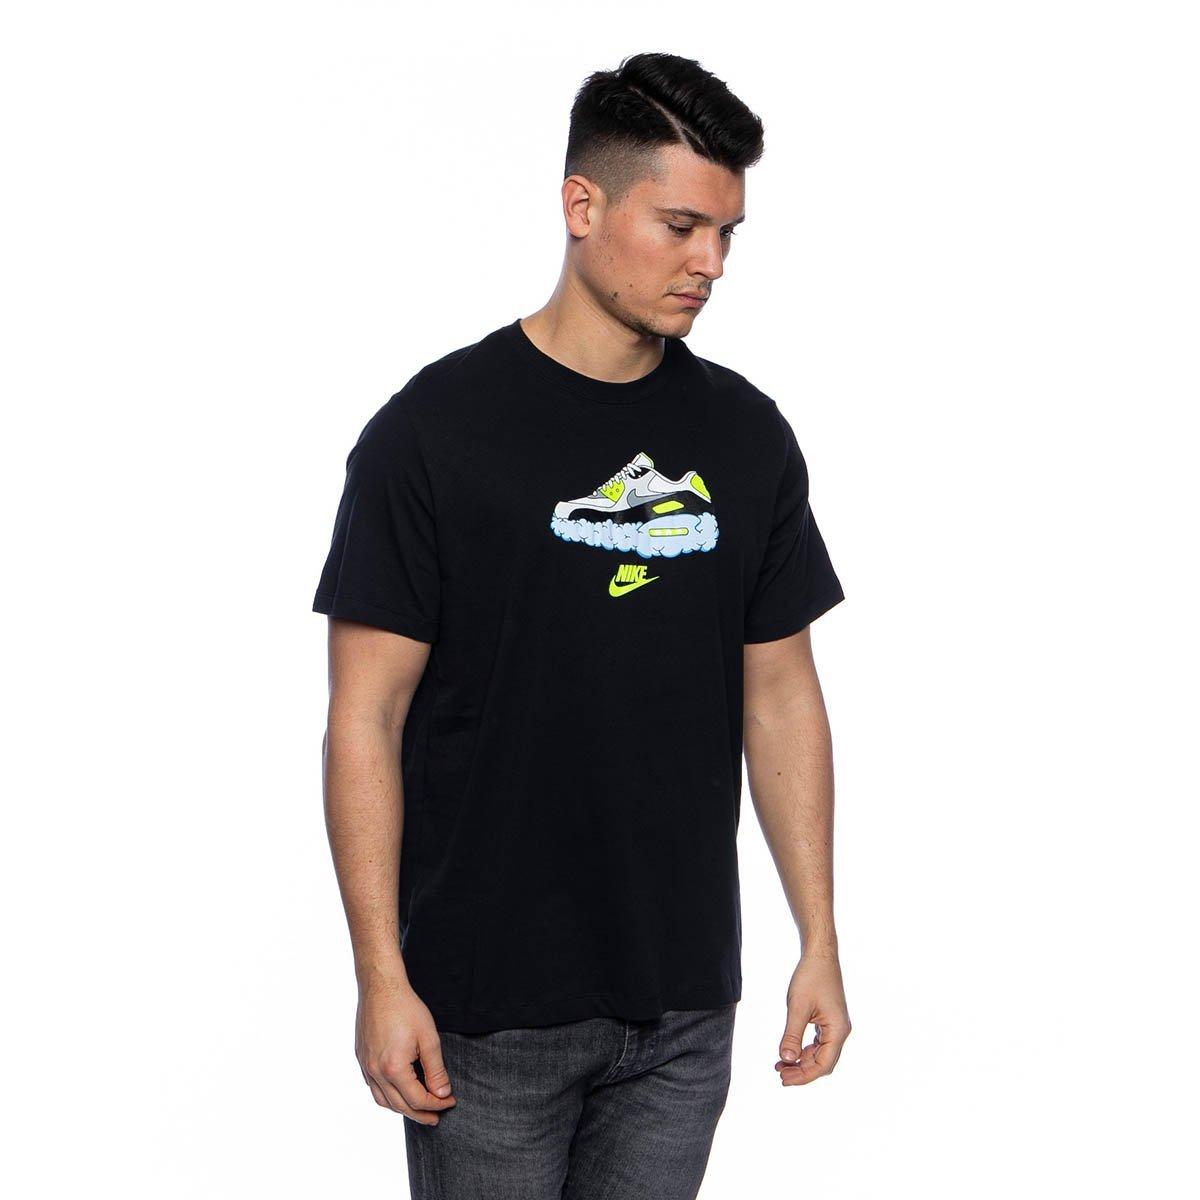 Koszulka Nike Air Max 90 T shirt black